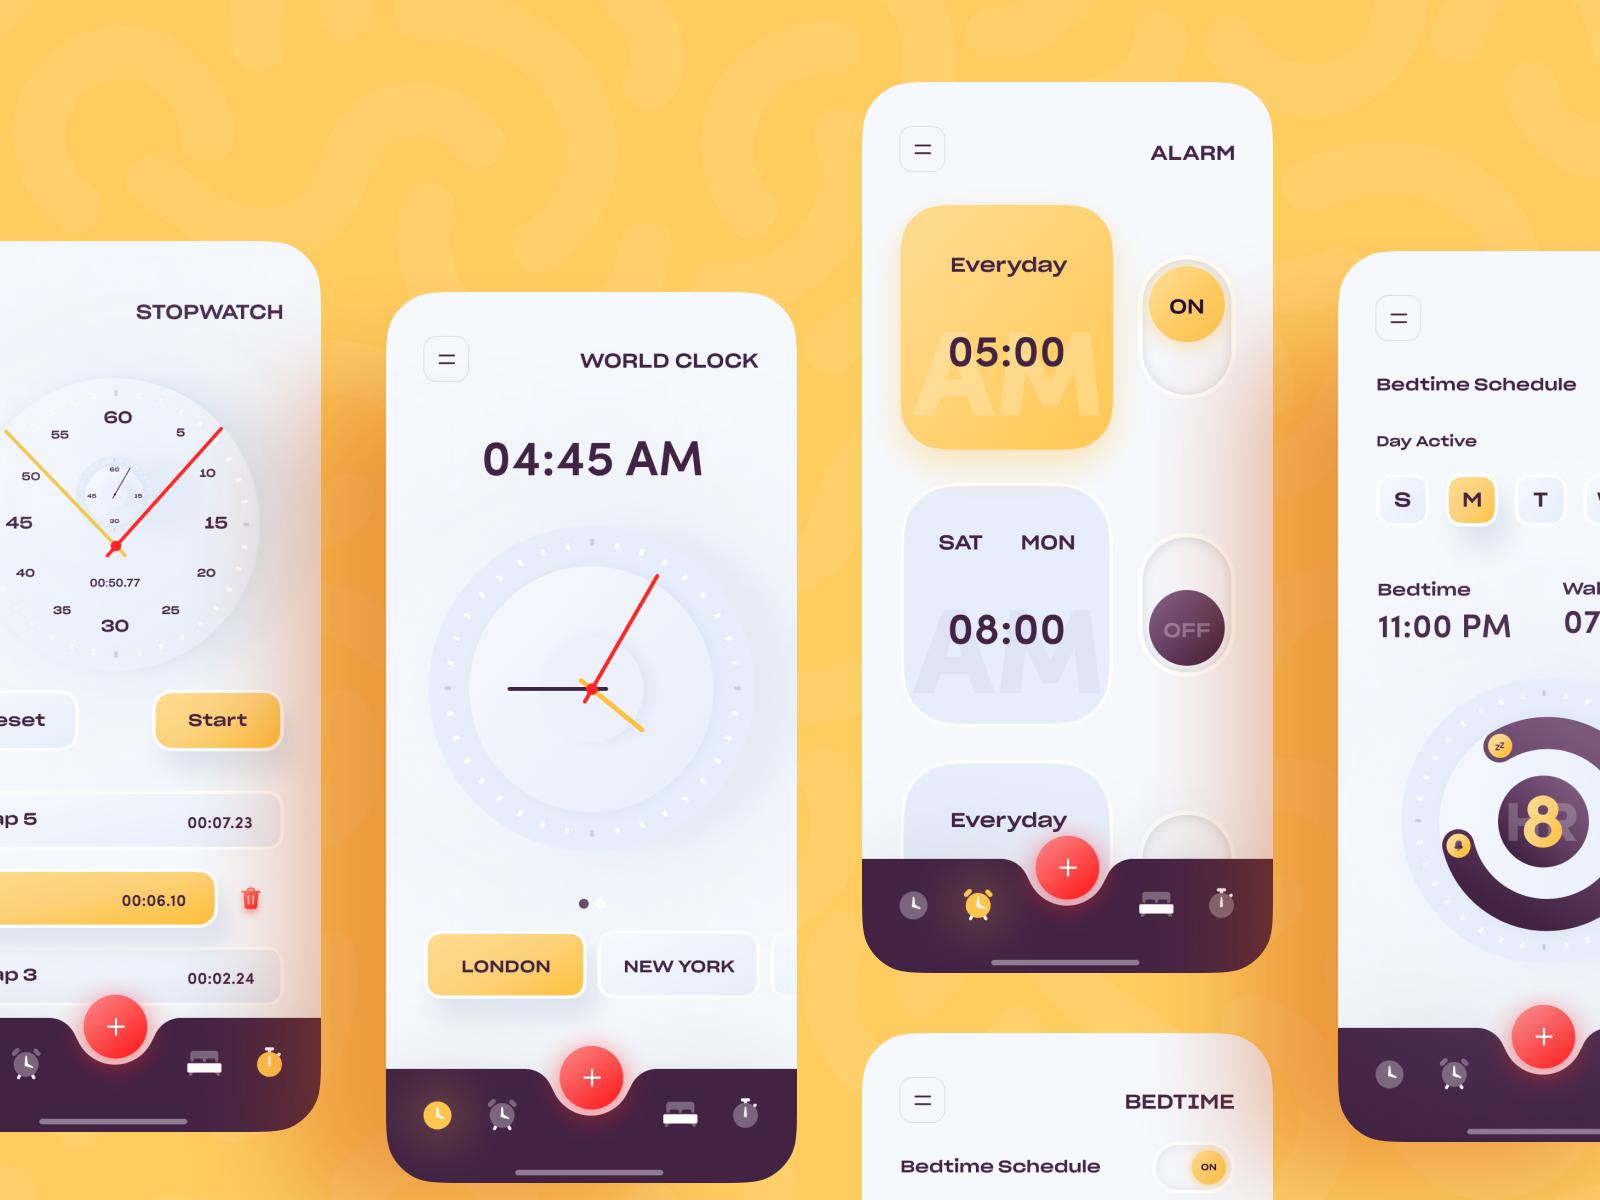 iOS Alarm Clock App in 2020 (With images)